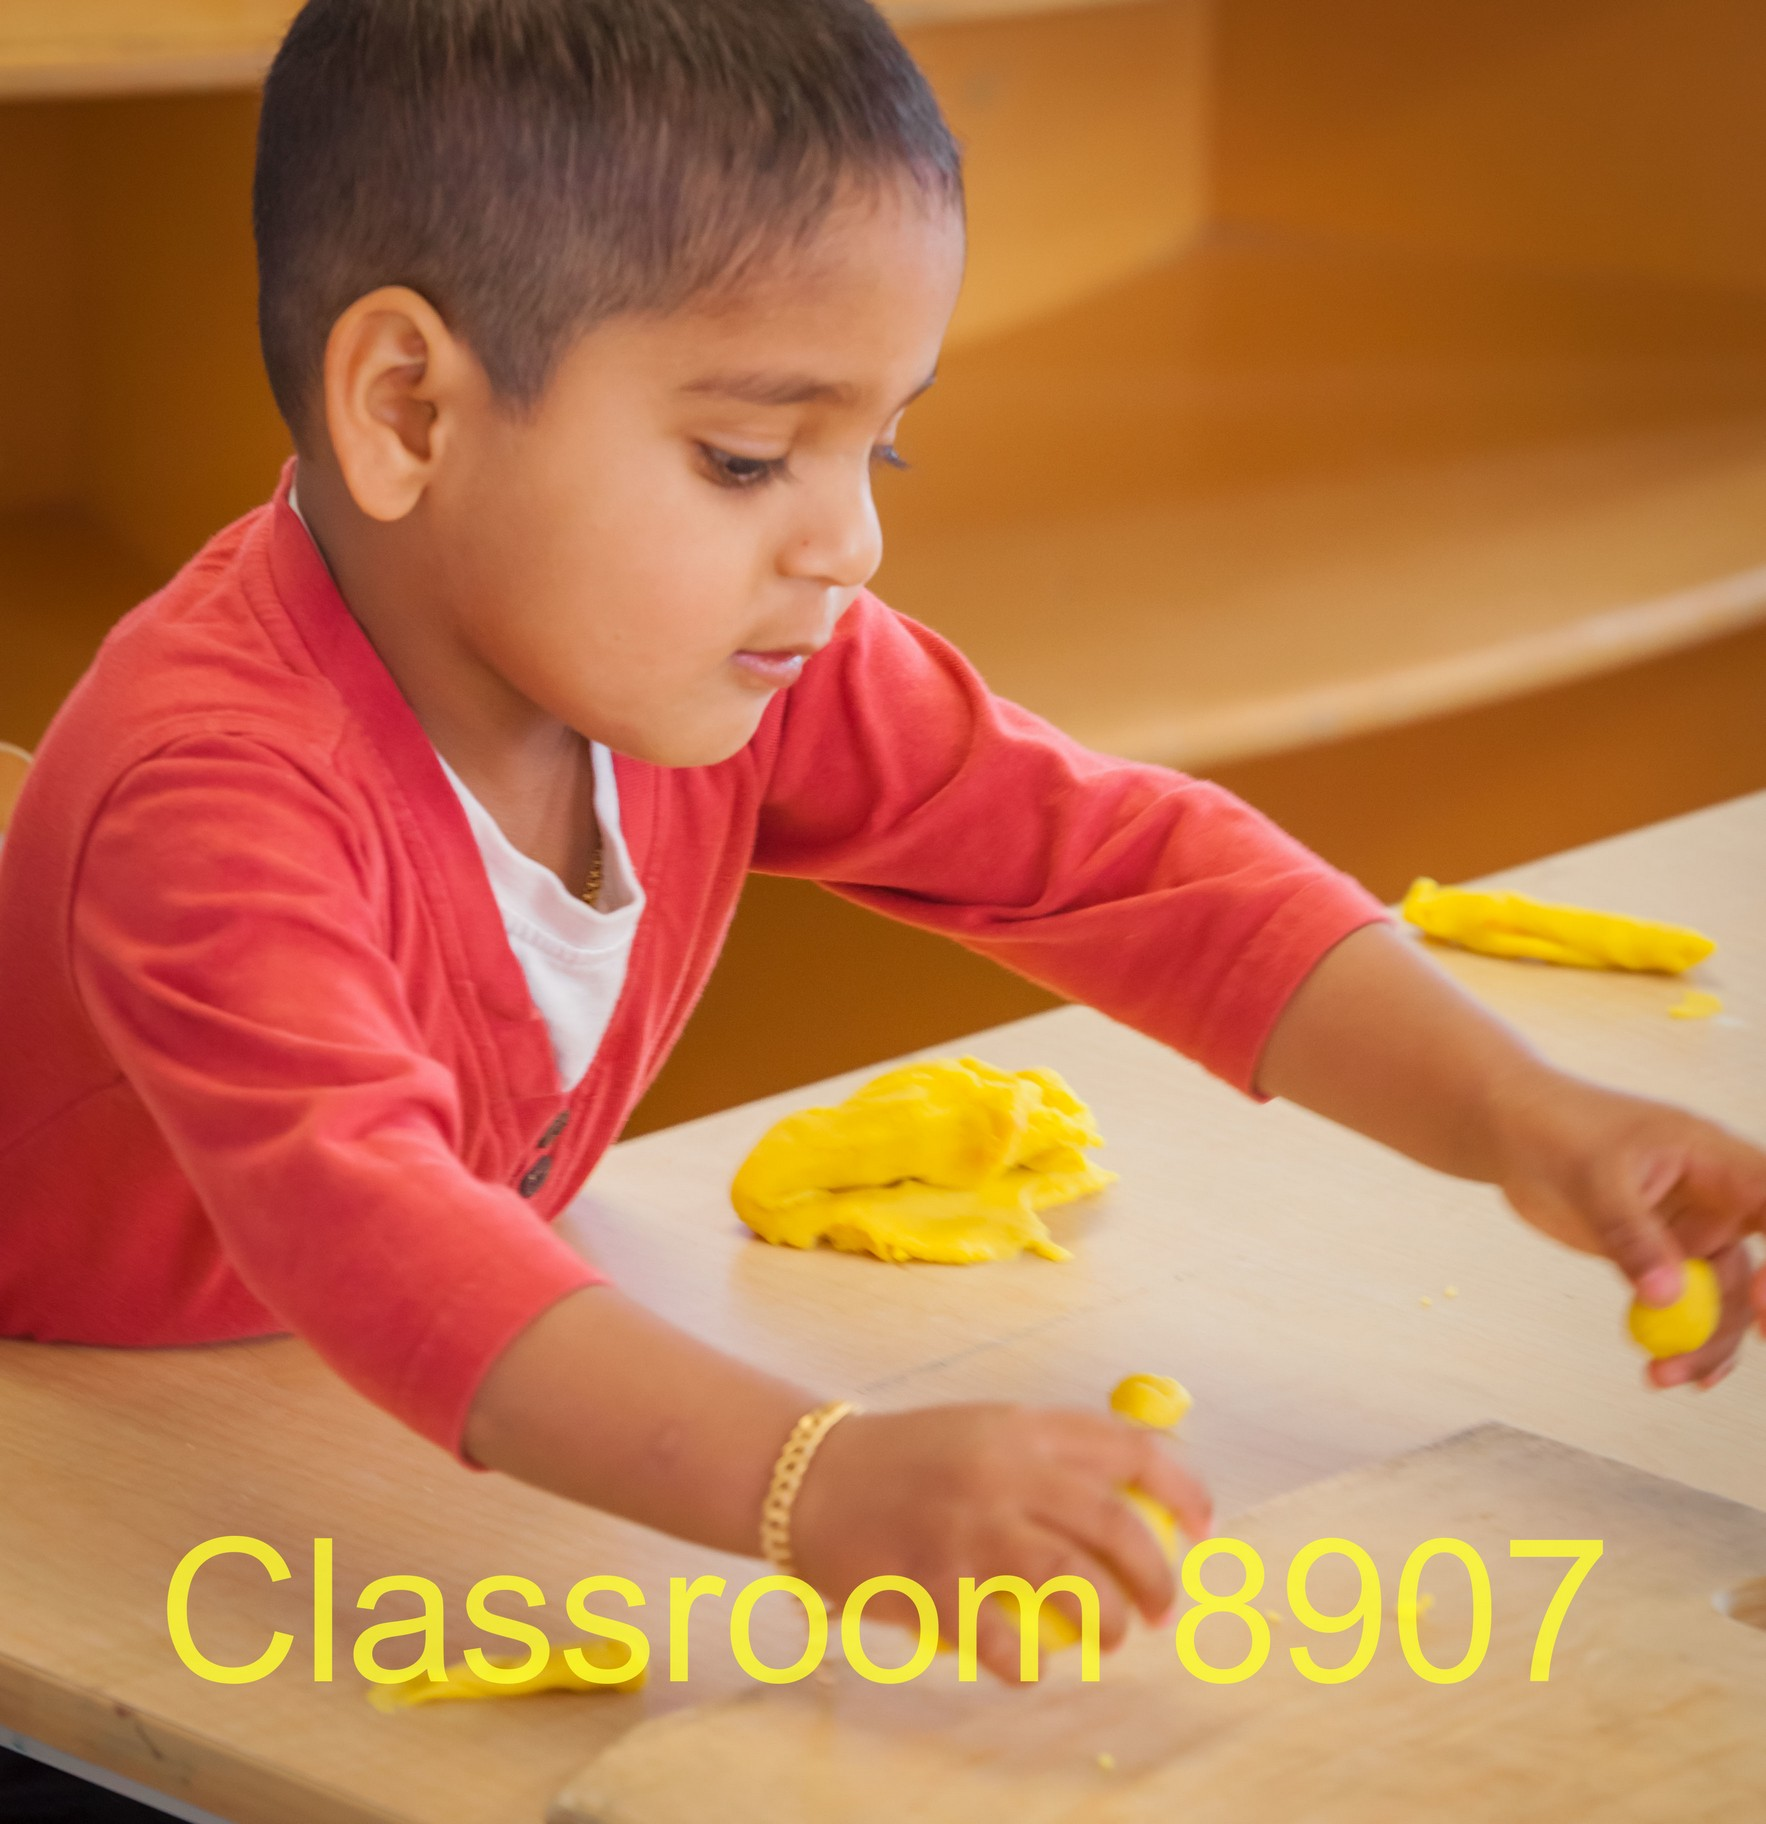 Classroom 8907